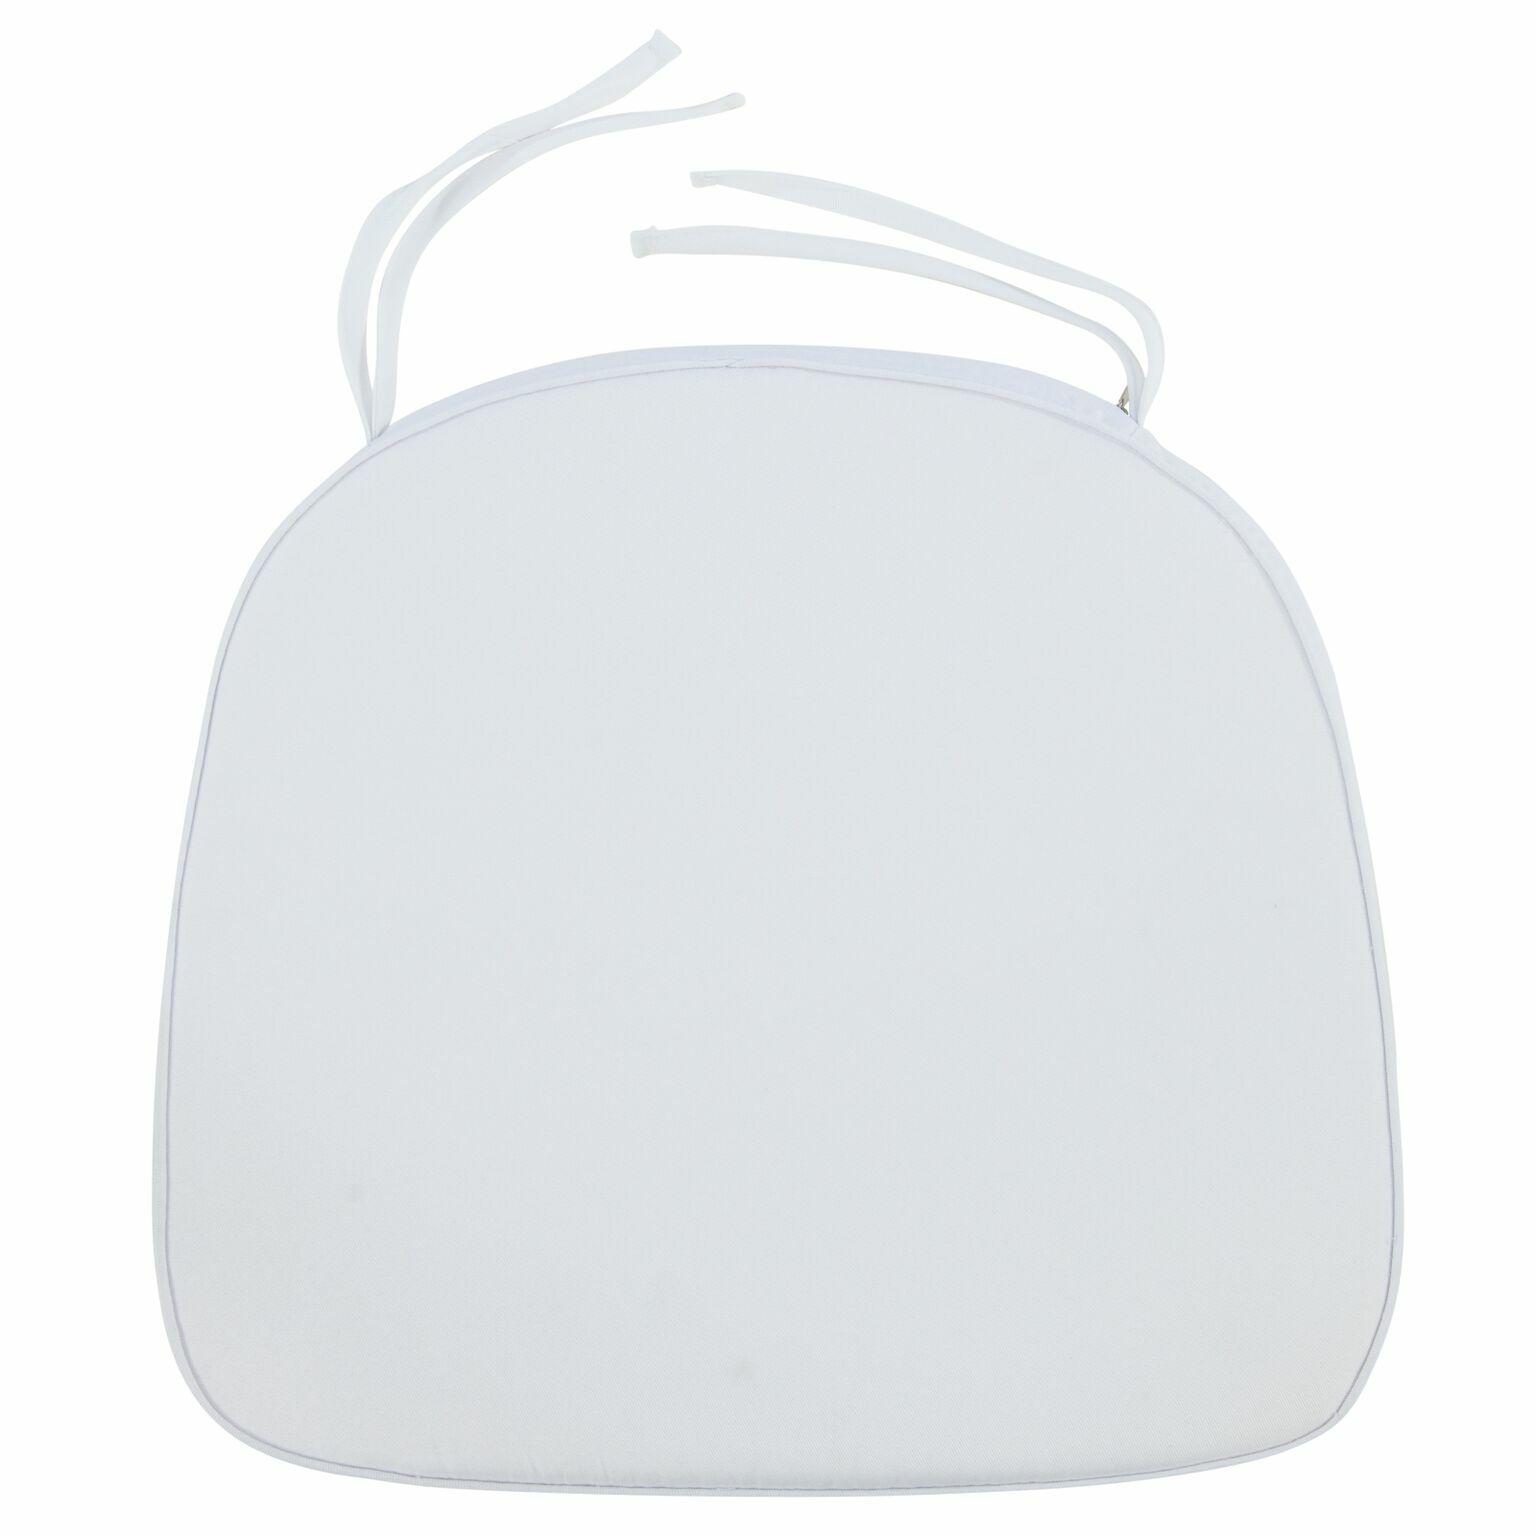 Dining Chair Cushion Fabric: White